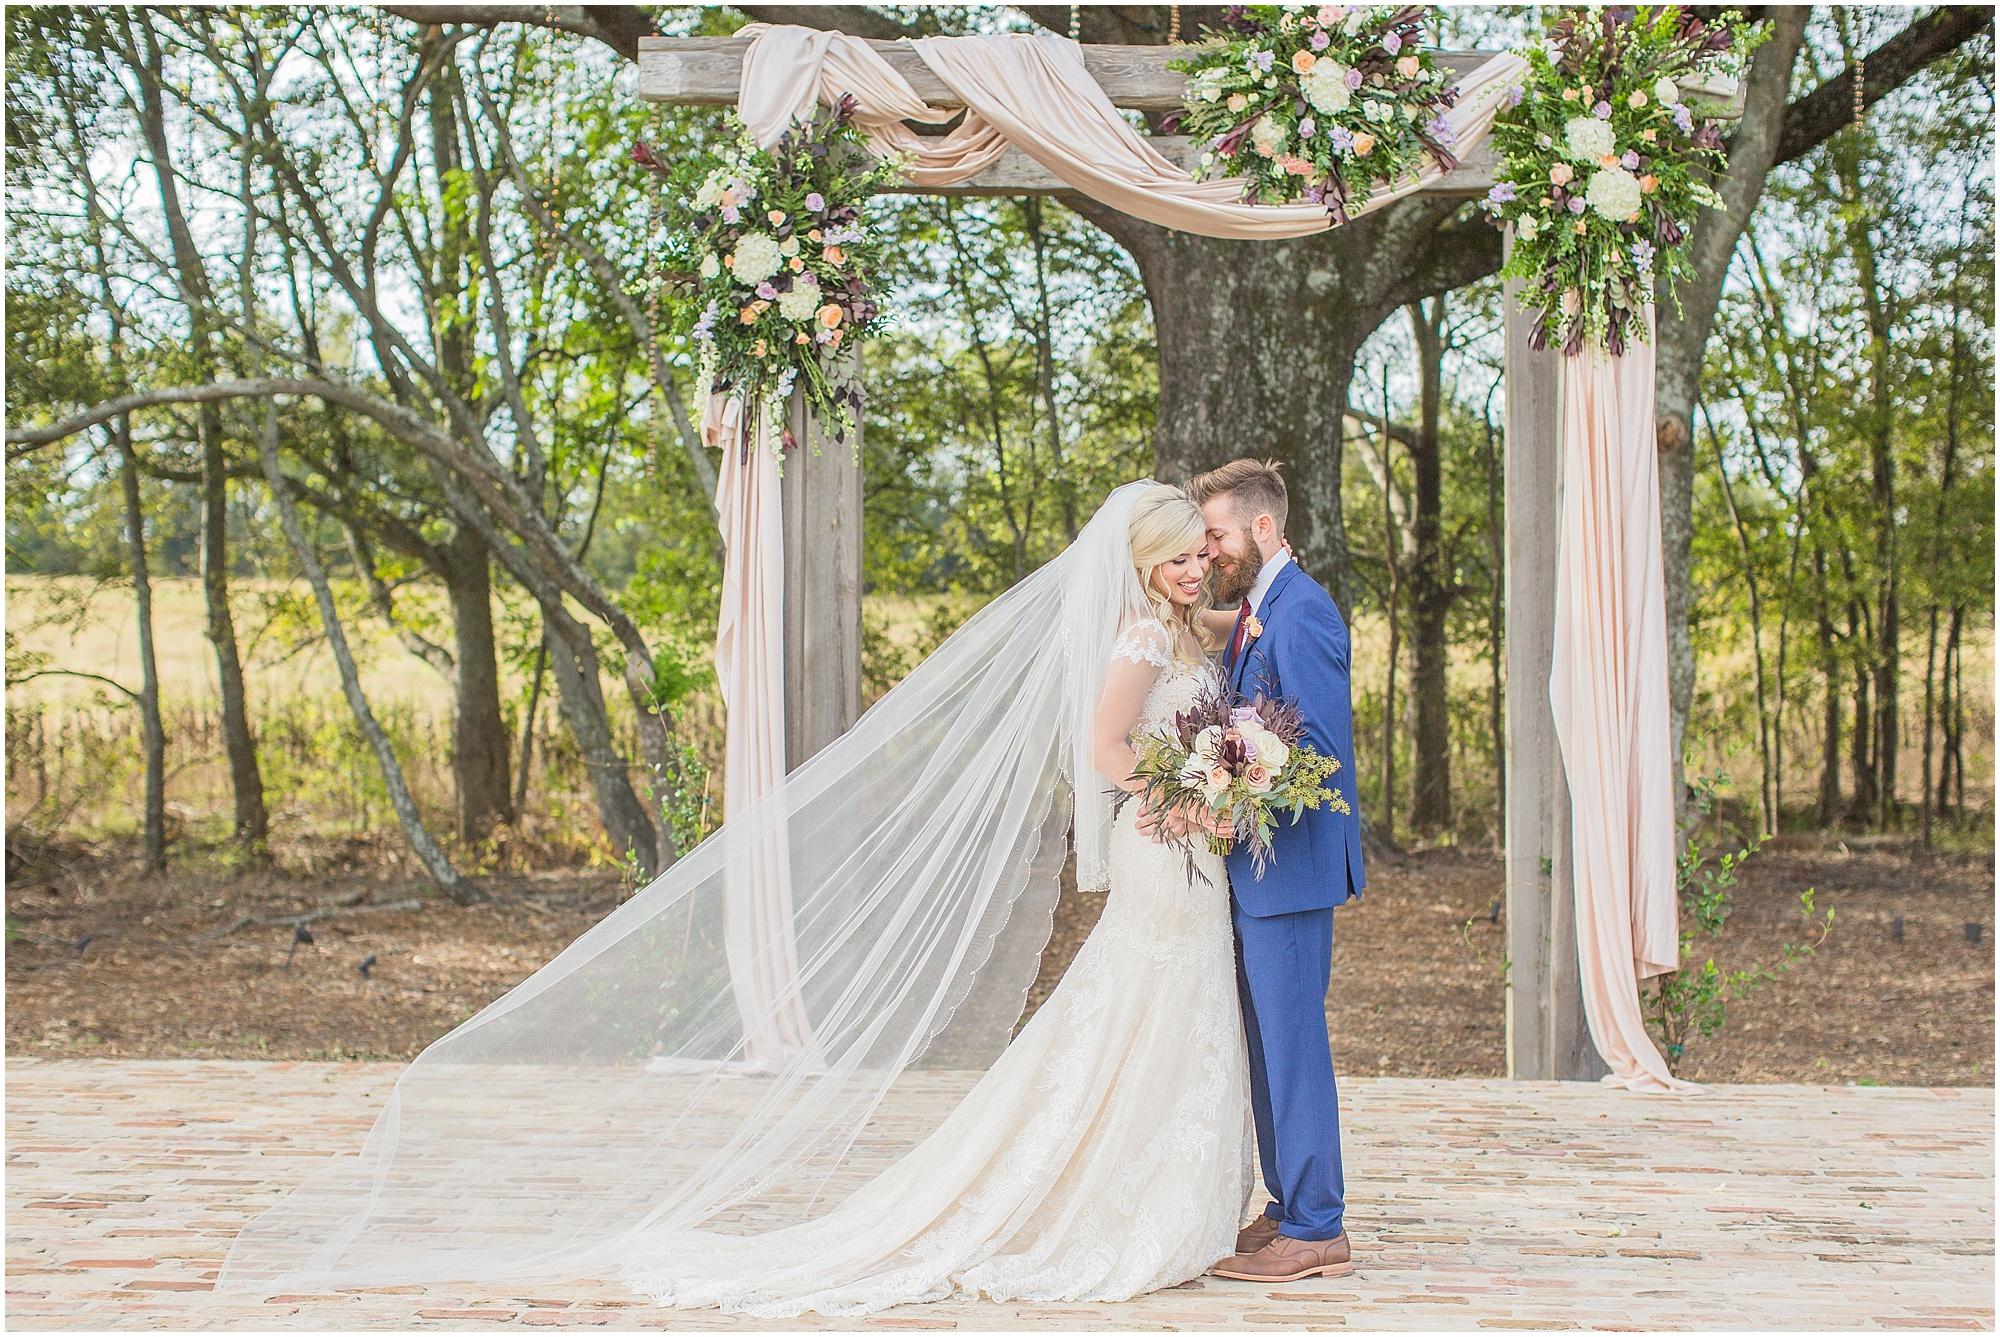 fall-wedding-bridlewood-of-madison-mississippi_0020.jpg